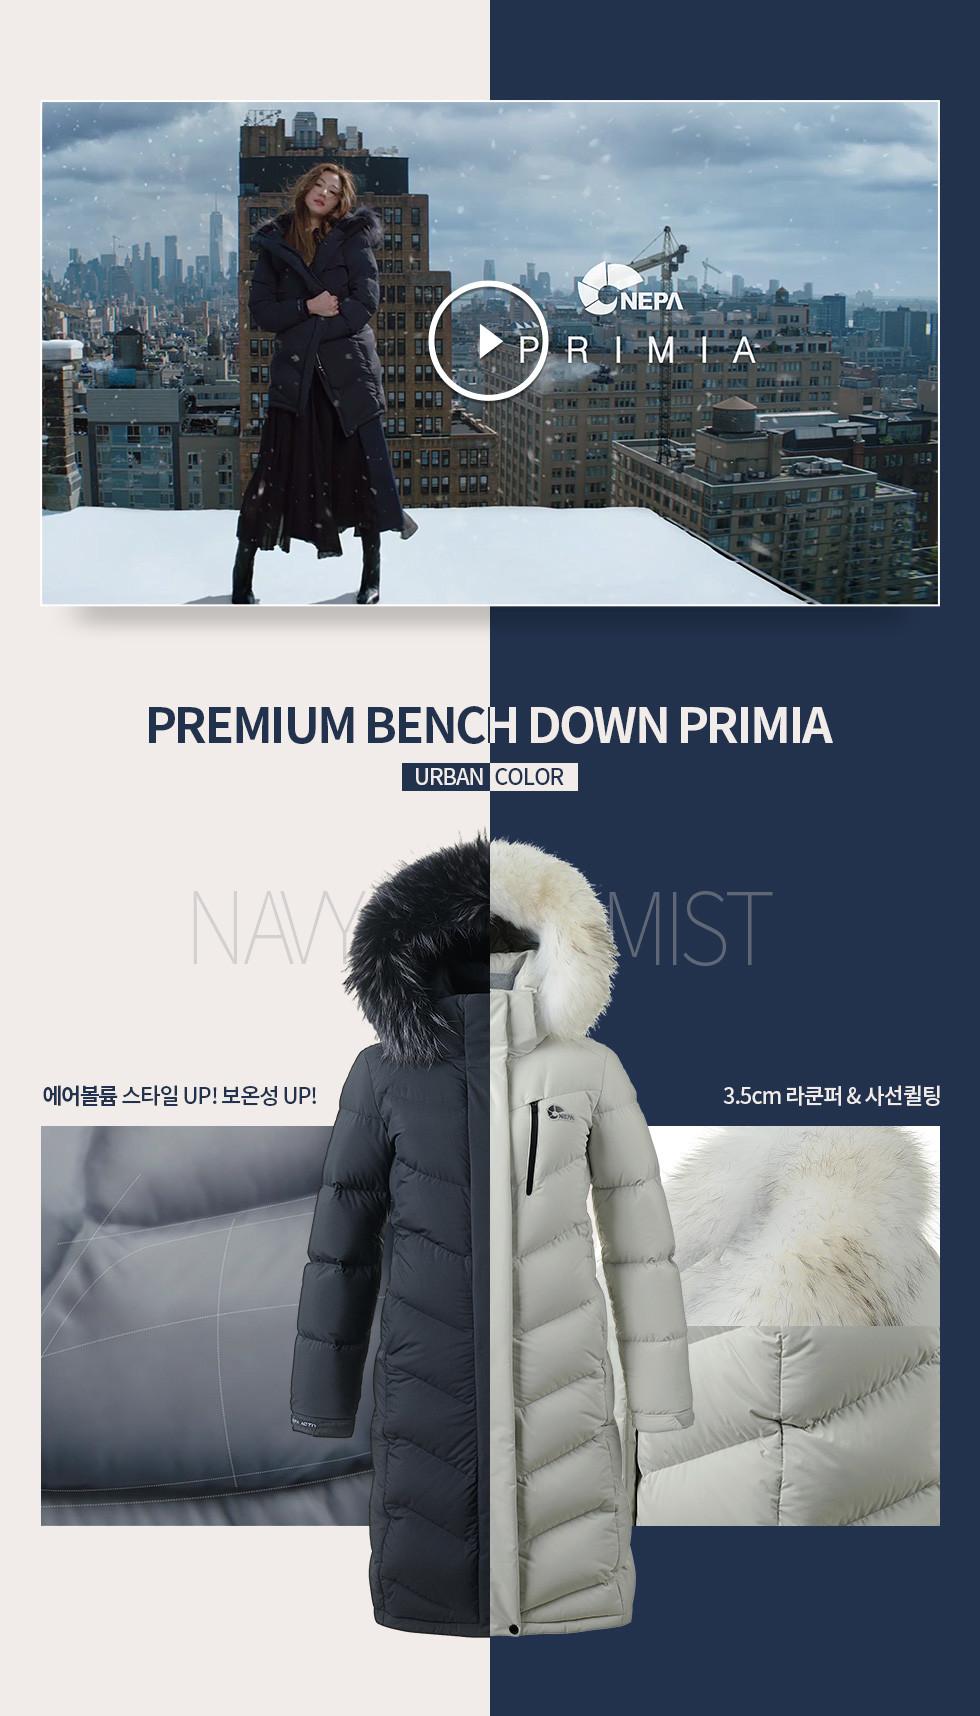 premium bench down primia 에어볼륨 스타일 UP! 보온성UP! 3.5cm 라쿤퍼&사선퀼팅